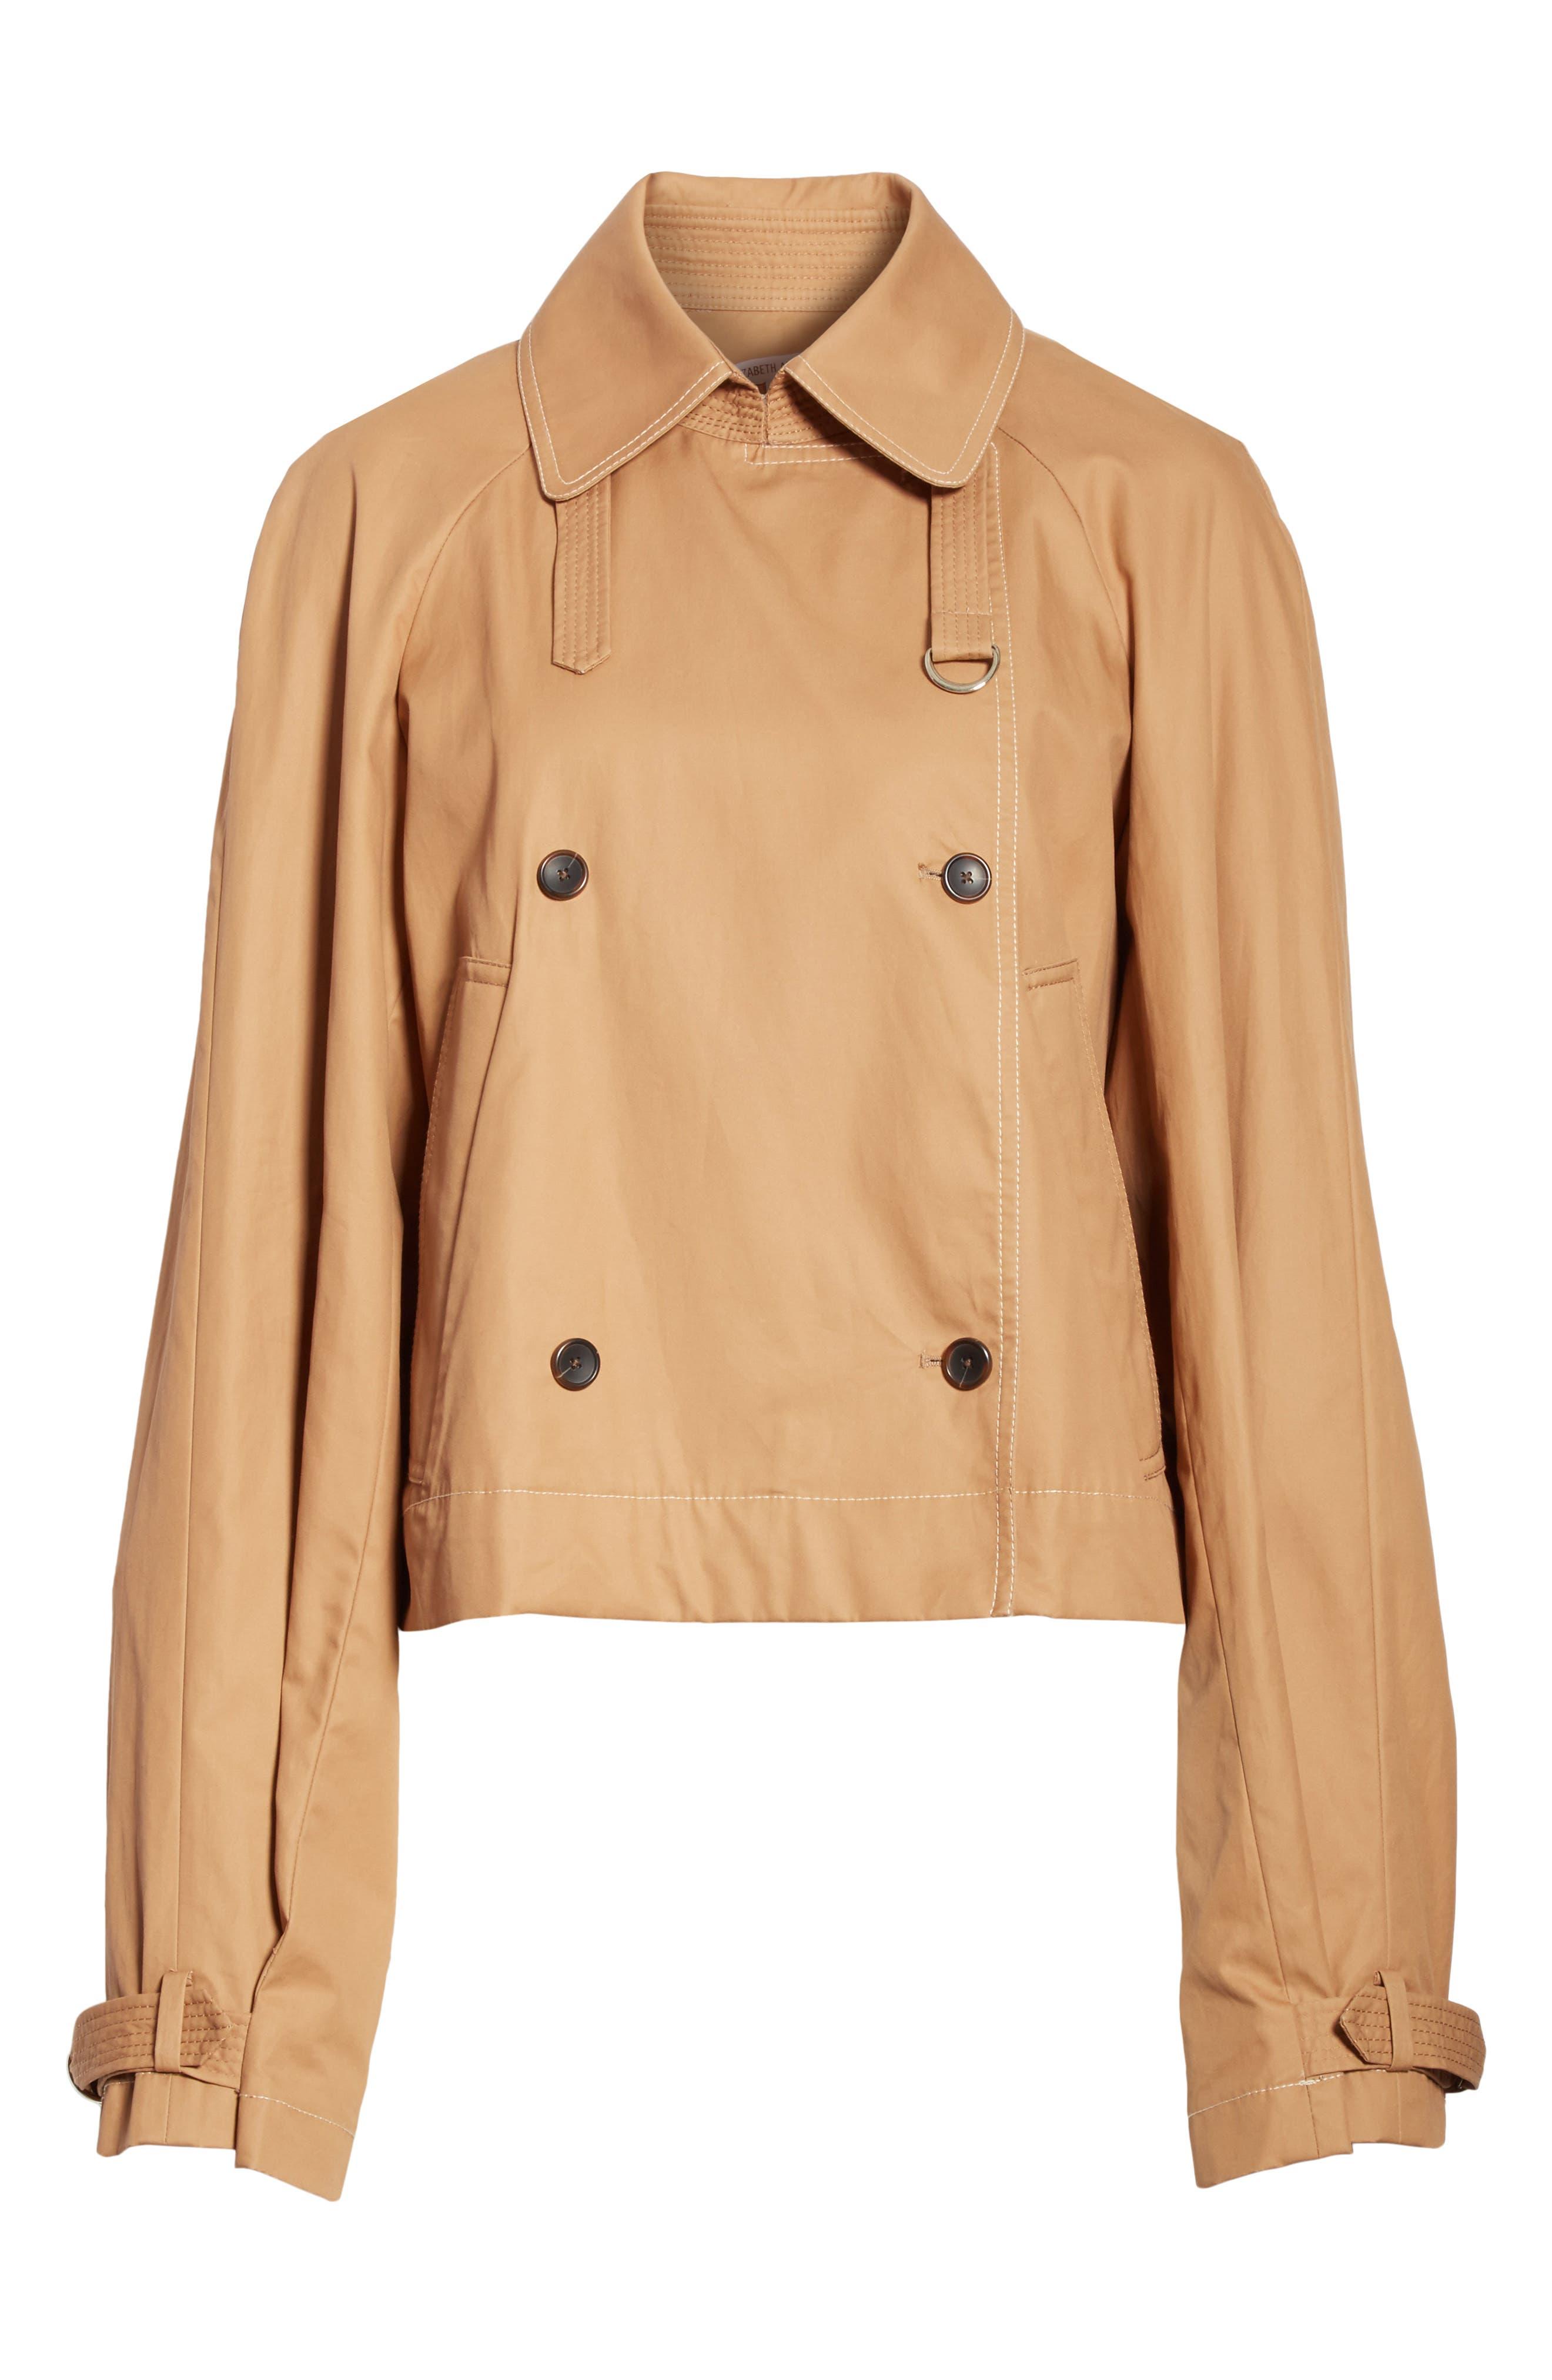 Eleta Short Trench Coat,                             Alternate thumbnail 5, color,                             206